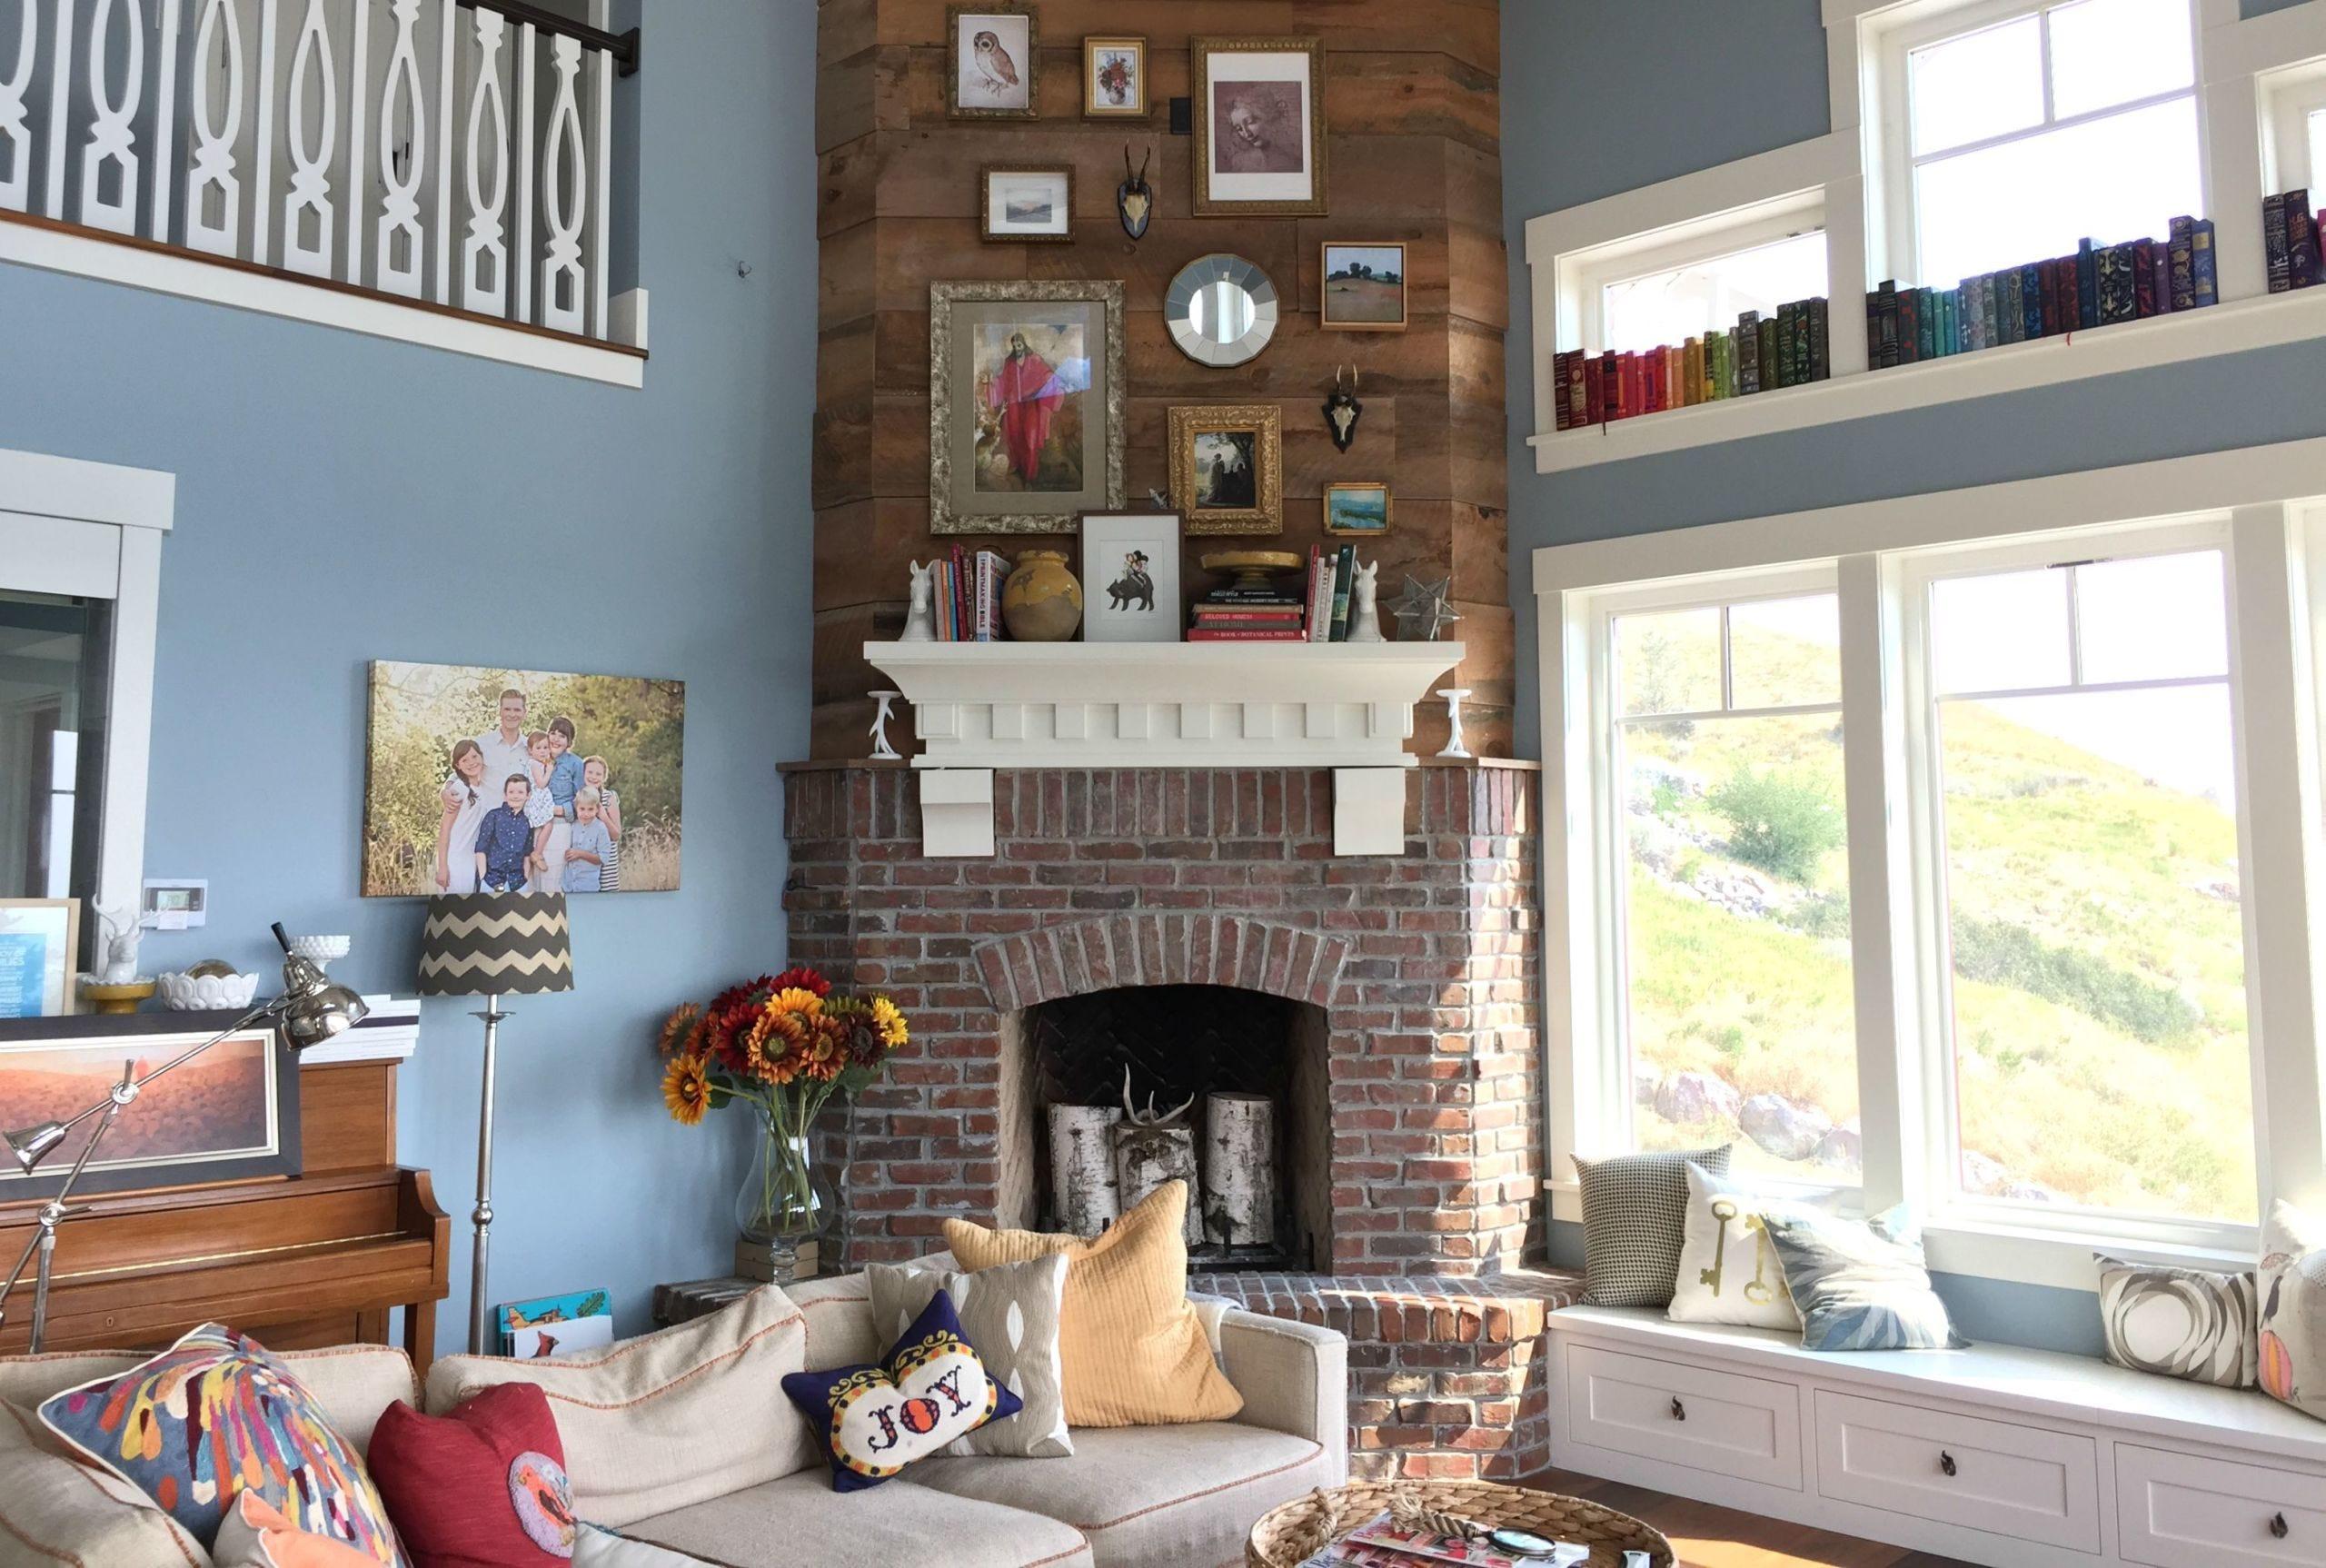 Room, Interior design, Green, Wall, Living room, Home, Interior design, Hearth, Fireplace, Grey,